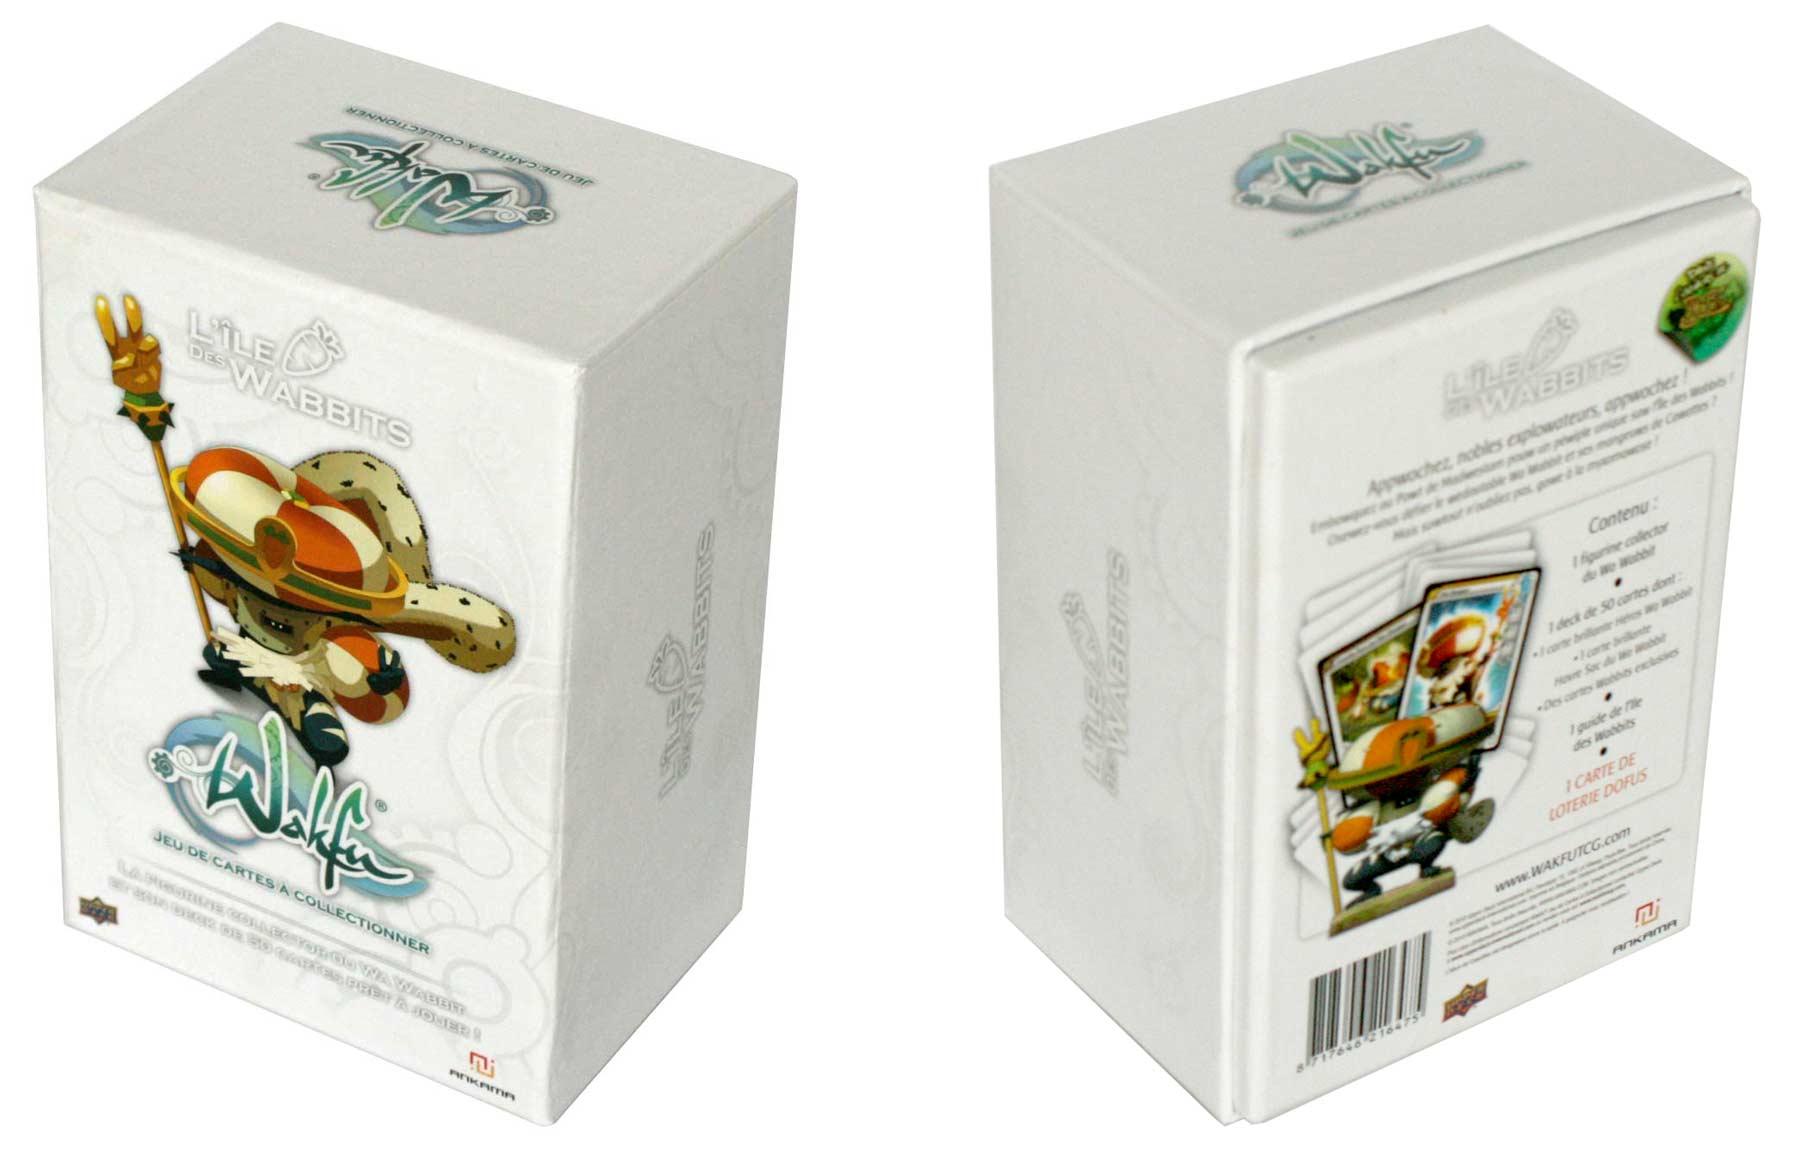 boite de la figurine Wa Wabbit (Dofus - Wakfu) - Packaging